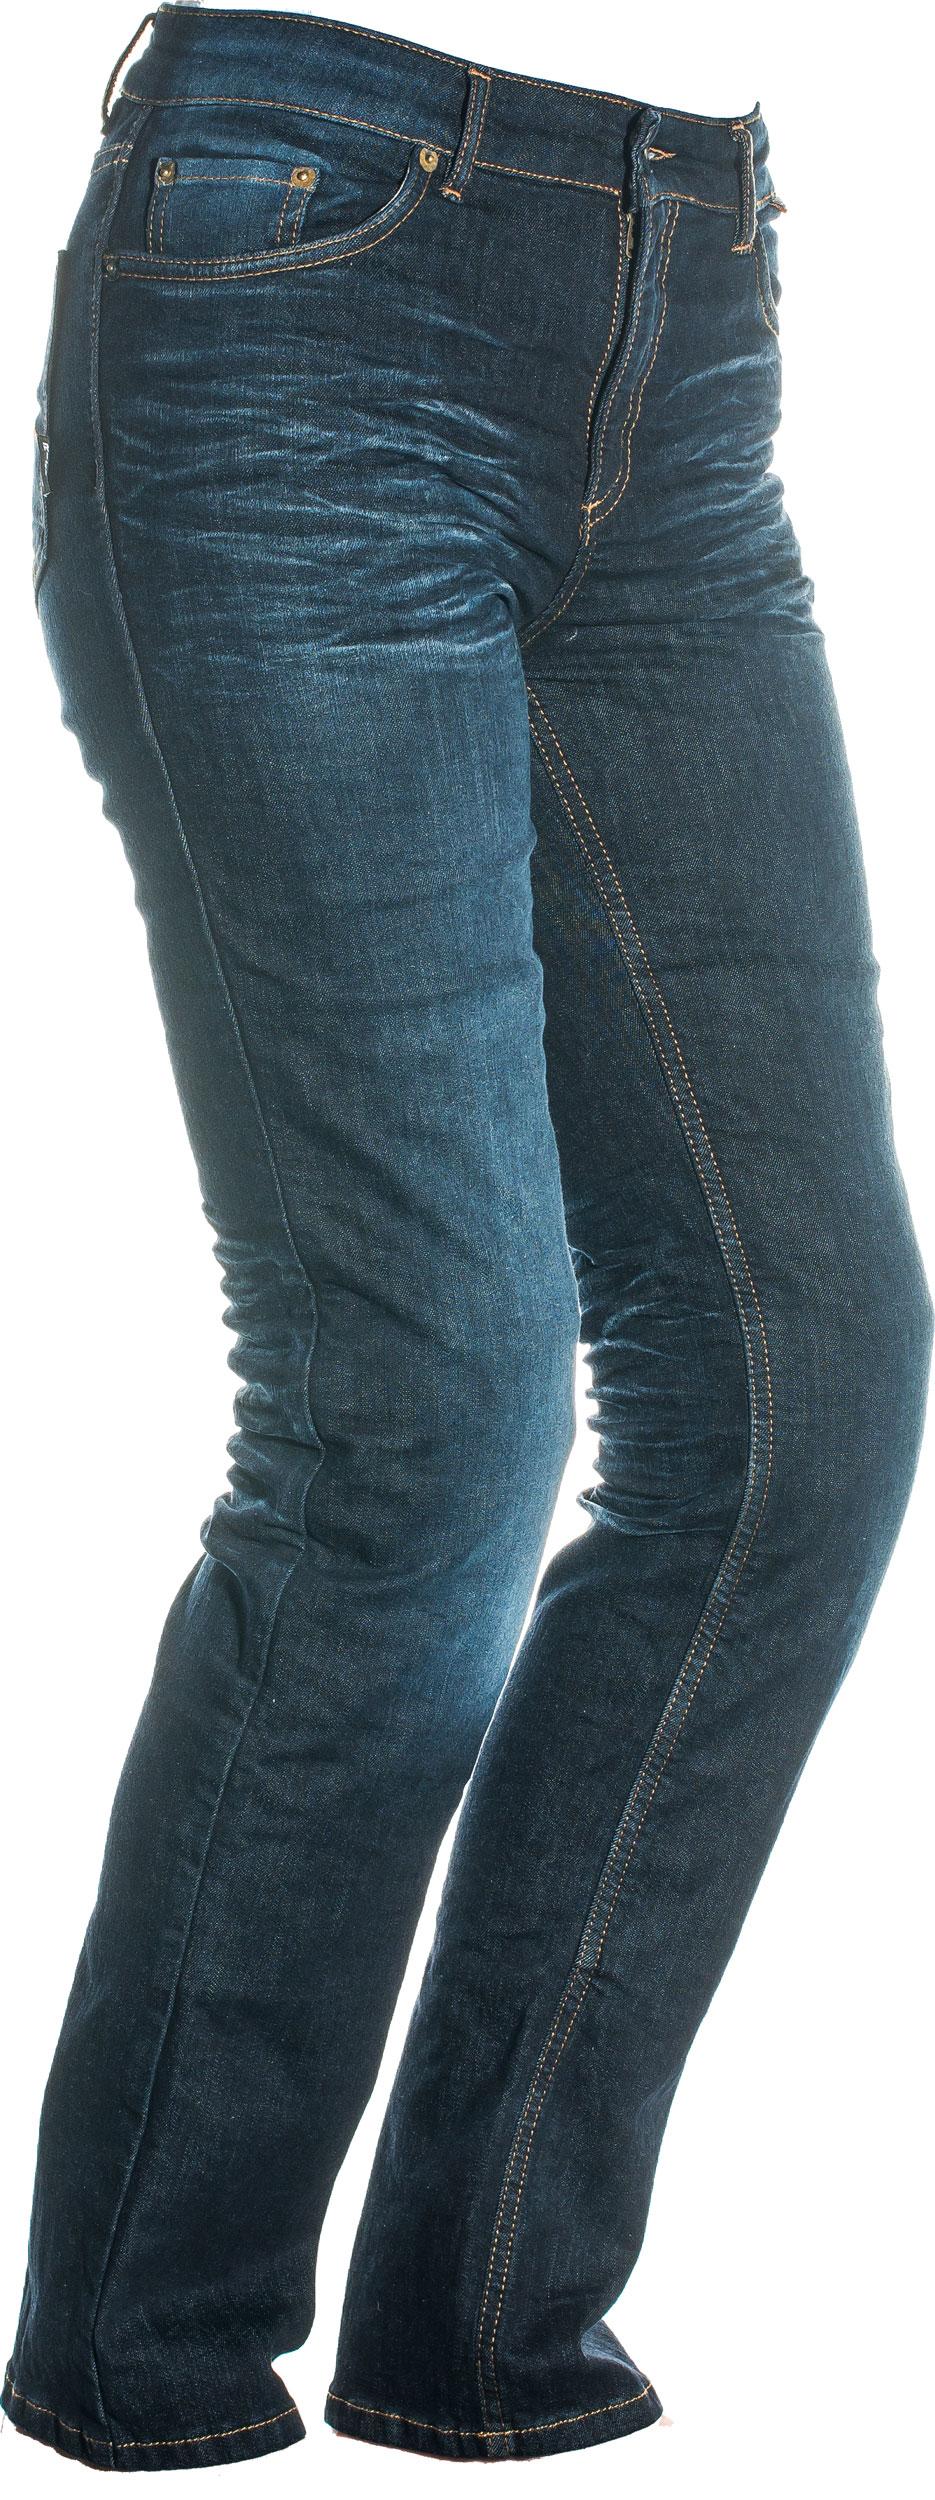 Richa Classic, Jeans - Blau - 30 7CLA-300-30